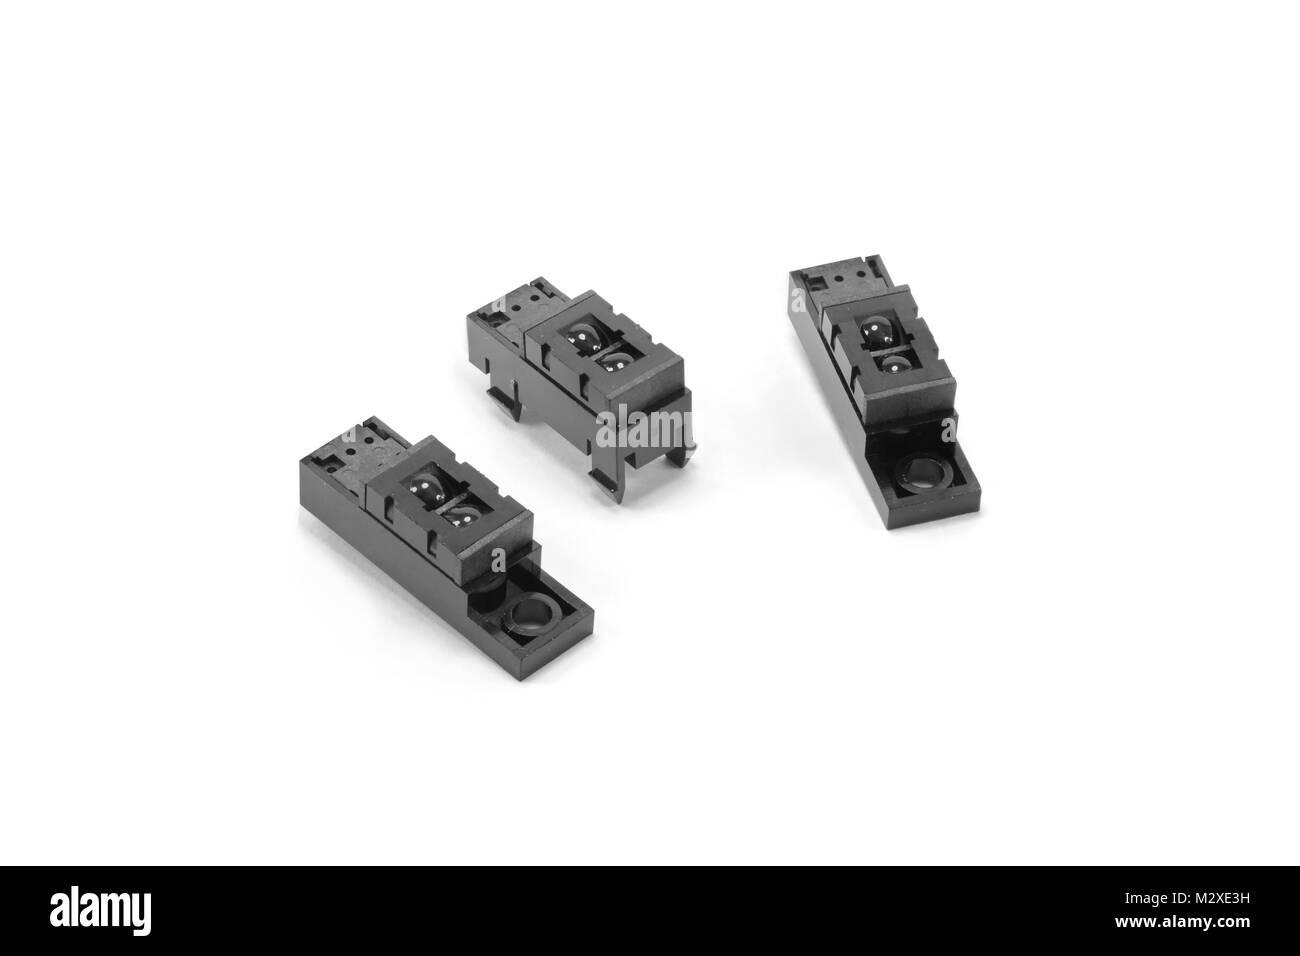 Sensor Light Stockfotos & Sensor Light Bilder - Alamy